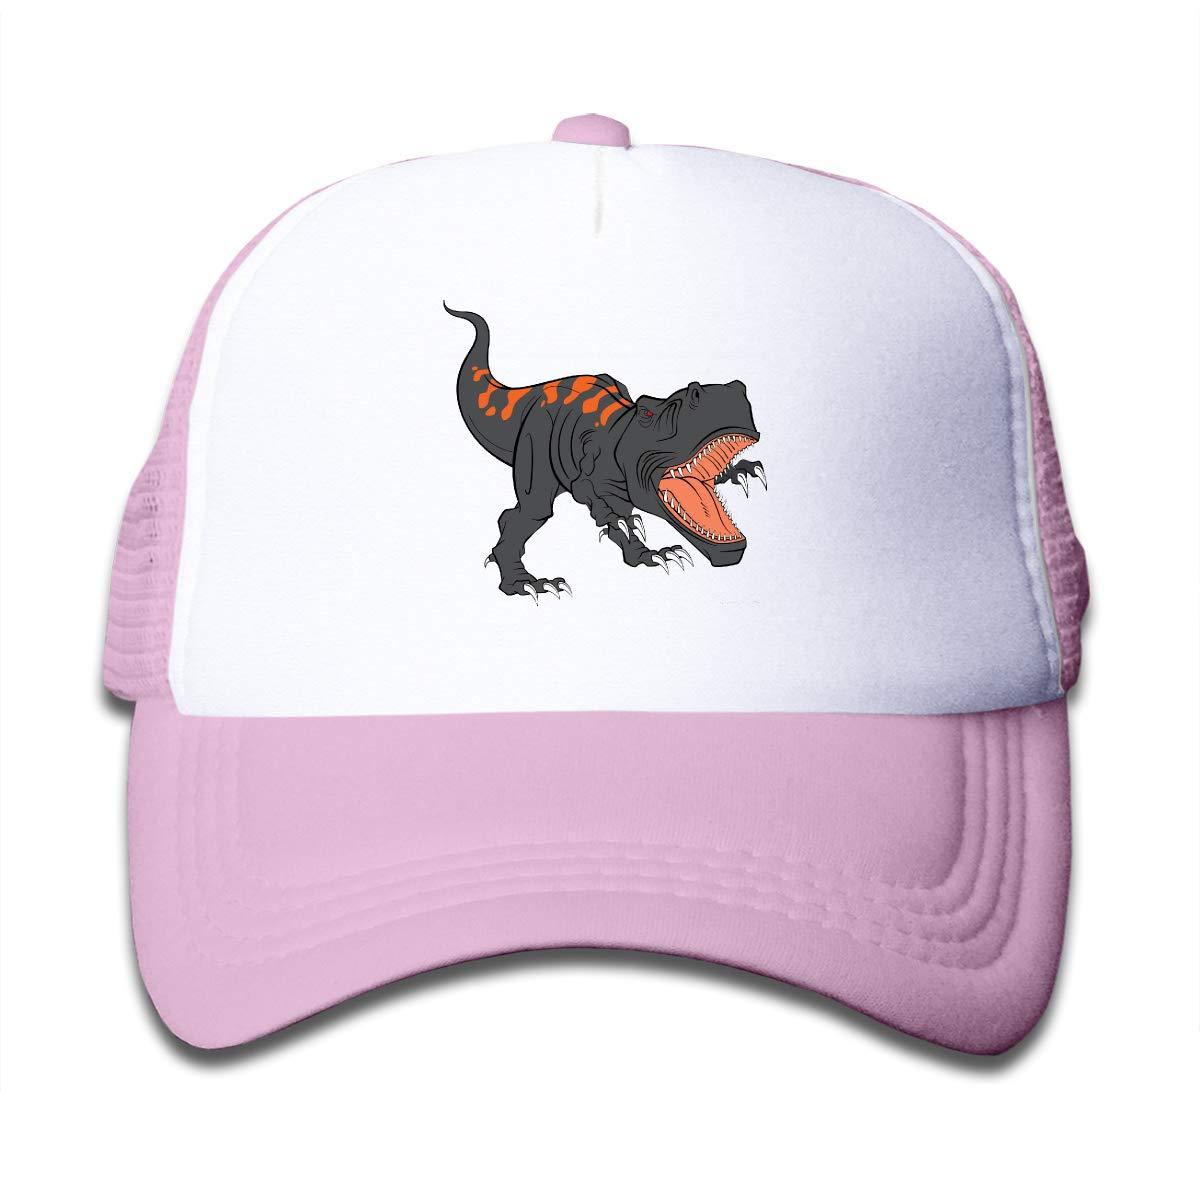 NVJUI JUFOPL The Fierce Dinosaur Childrens Baseball Cap Adjustable Mesh Hats